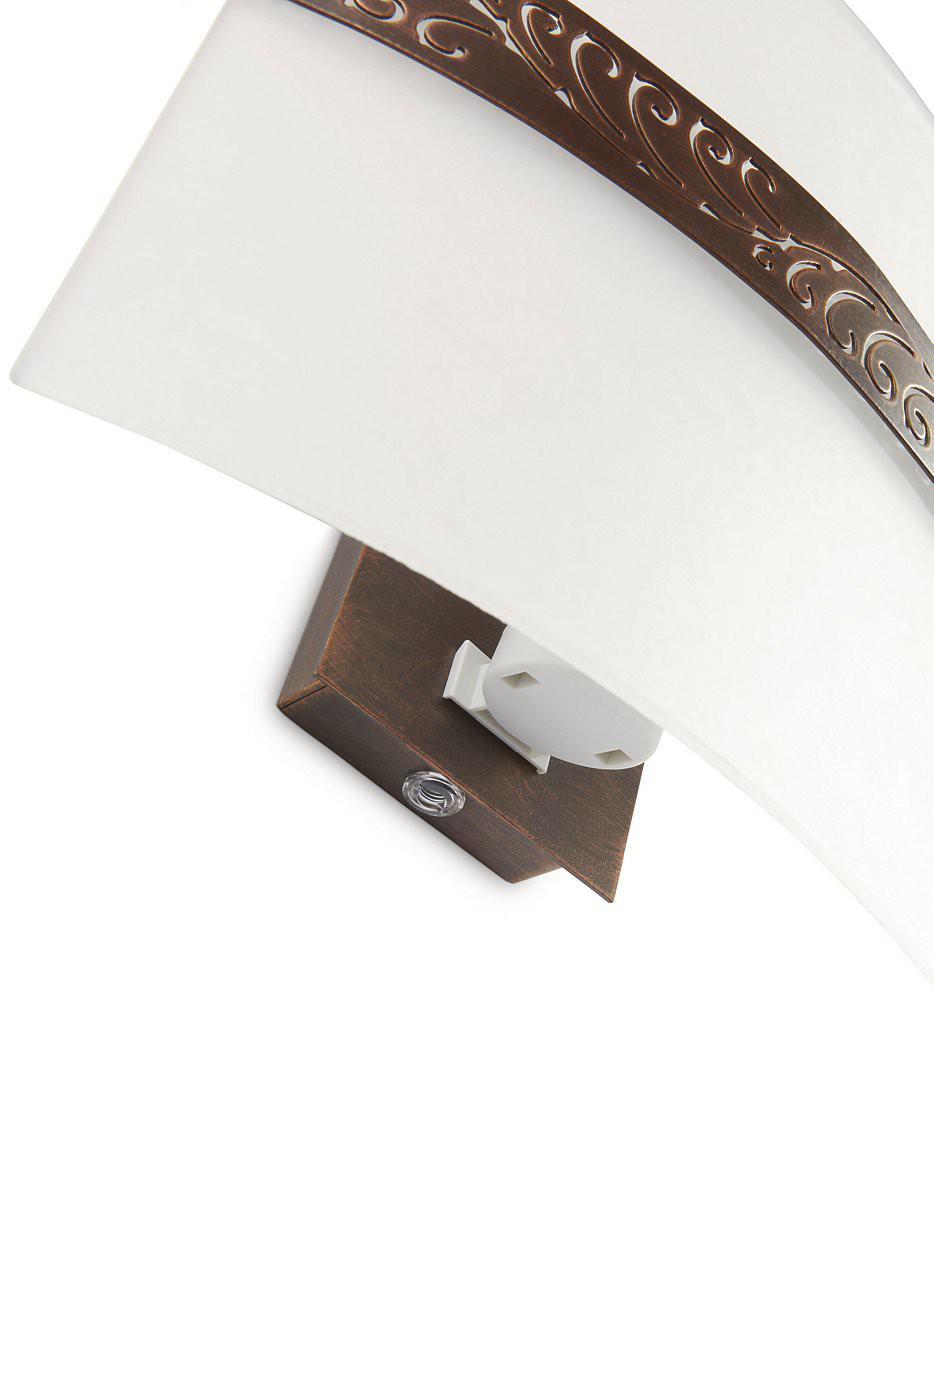 Philips wandlampe lampe livu wandleuchte rustikal energiespar kaufen bei - Wandleuchte rustikal ...